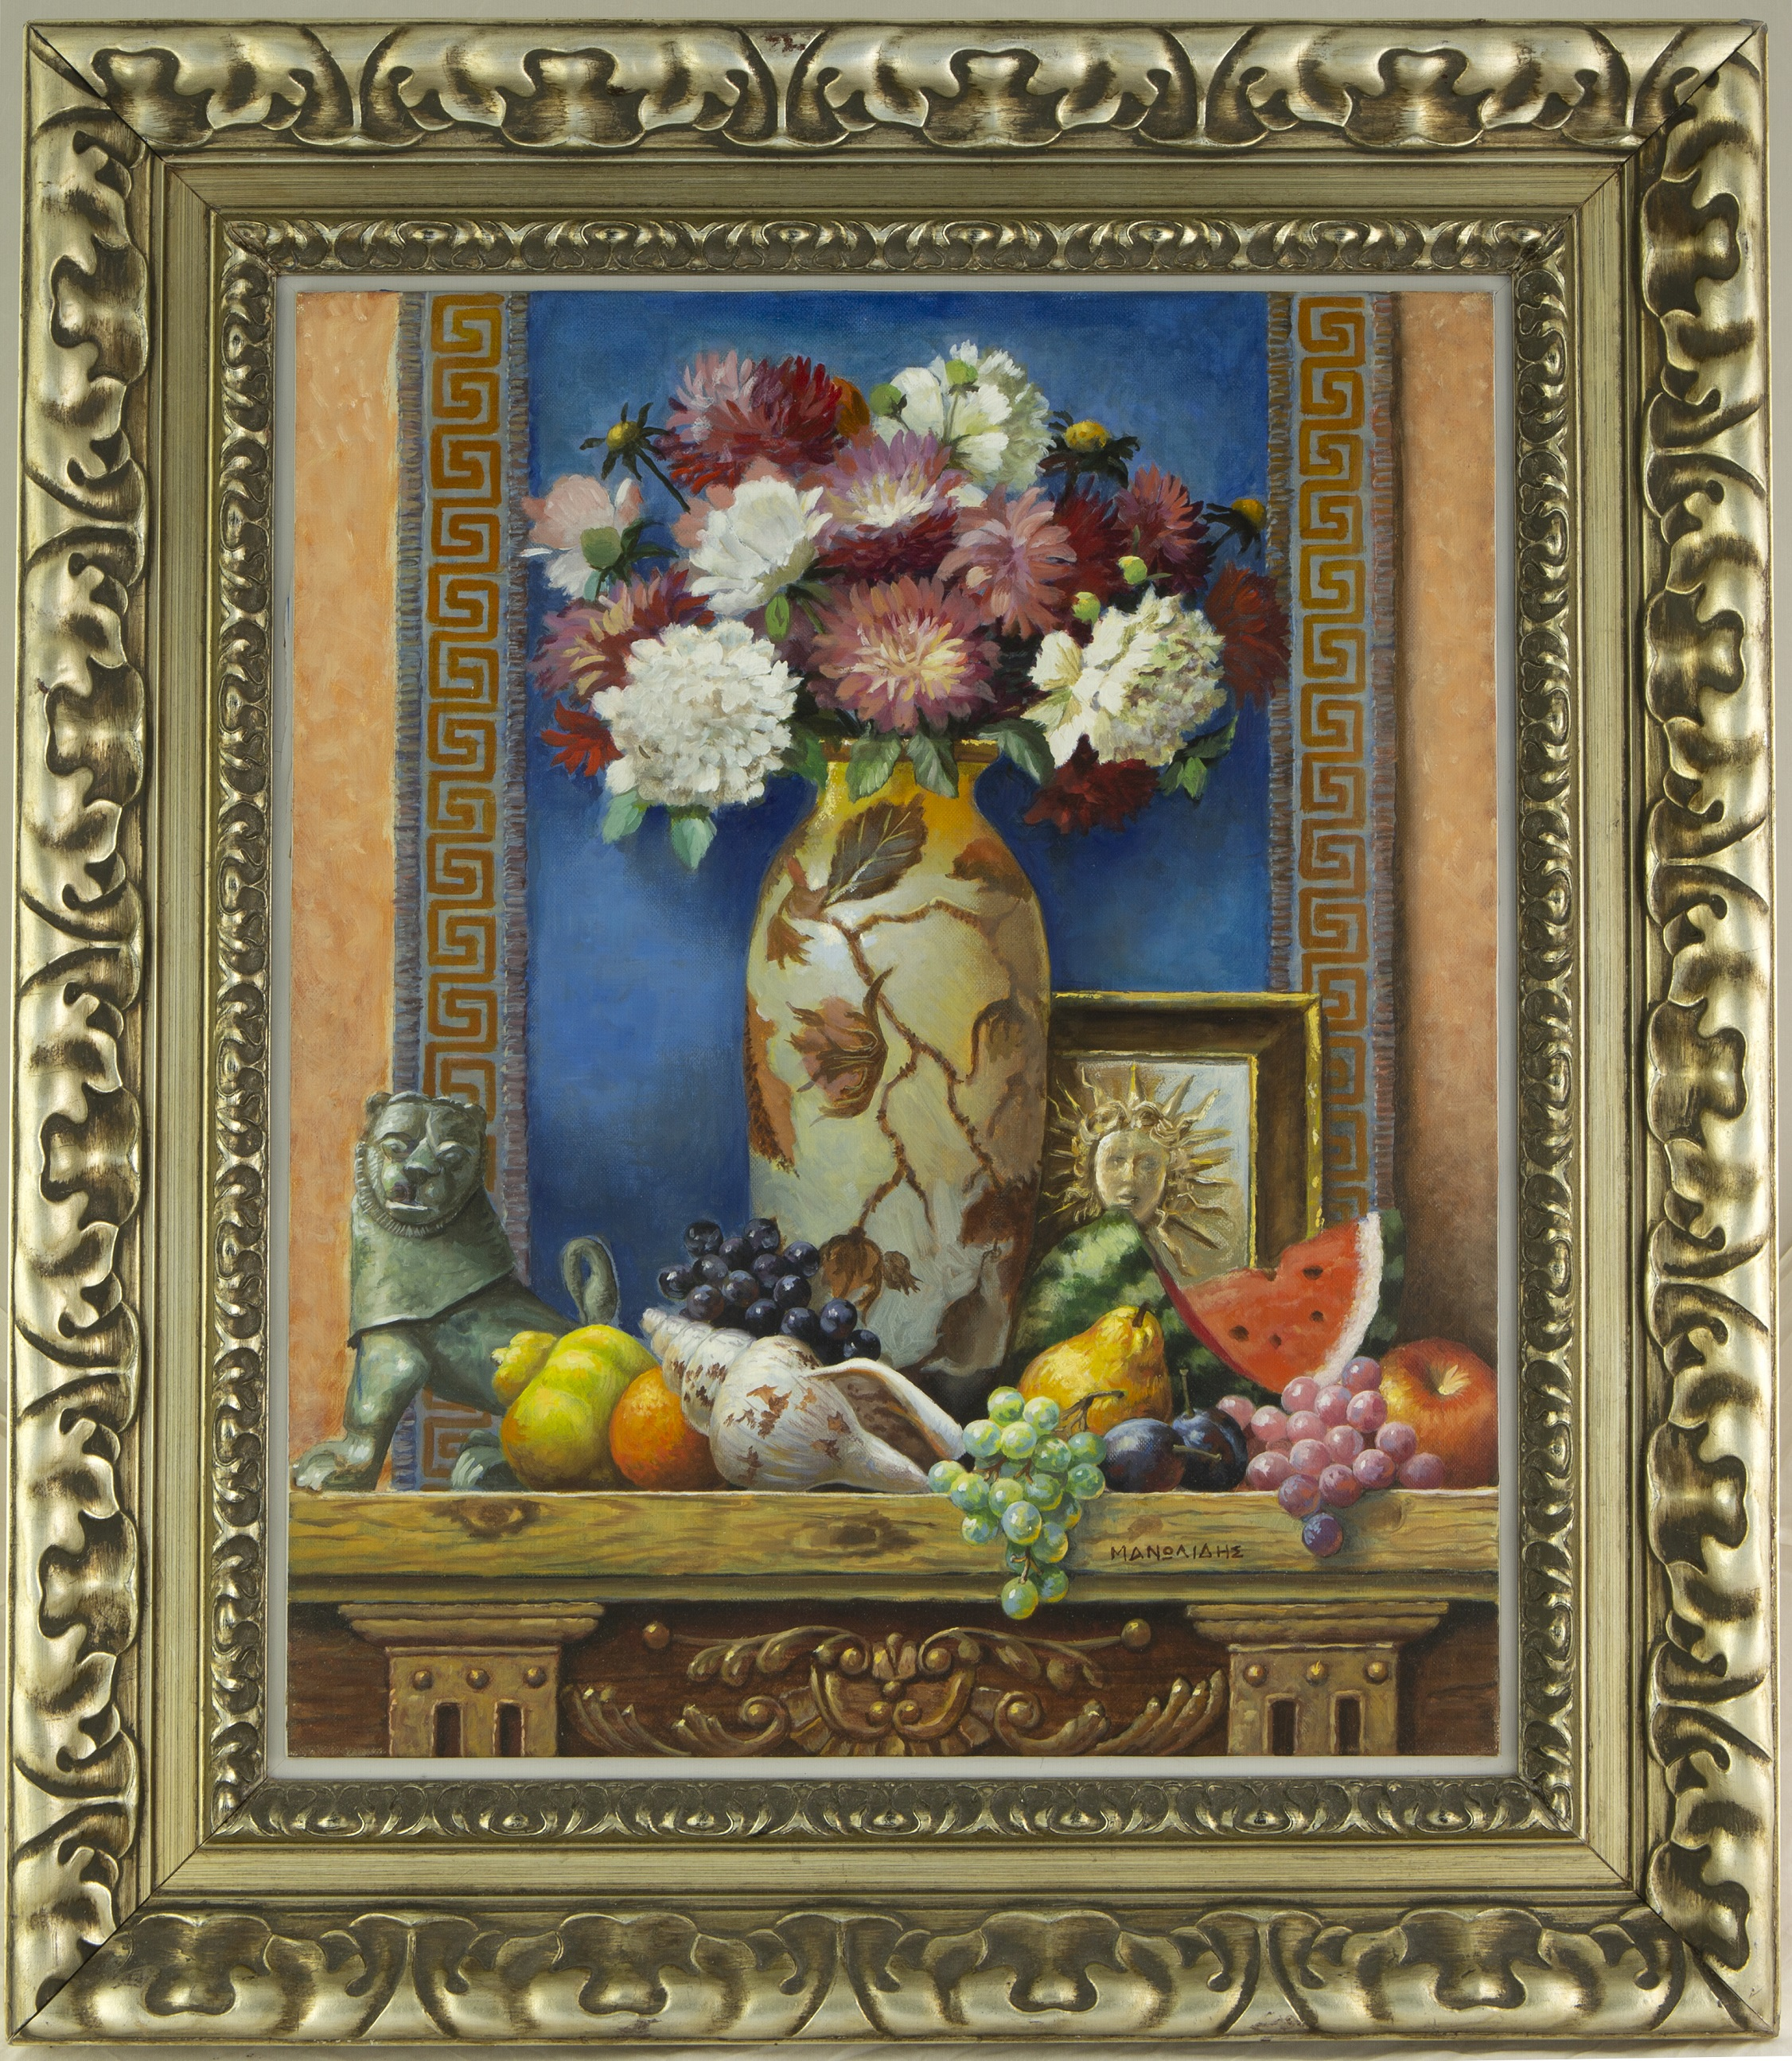 Theodoros Manolidis (Greek, born 1940) (AR), Composition with Chinese Vase, oil on canvas